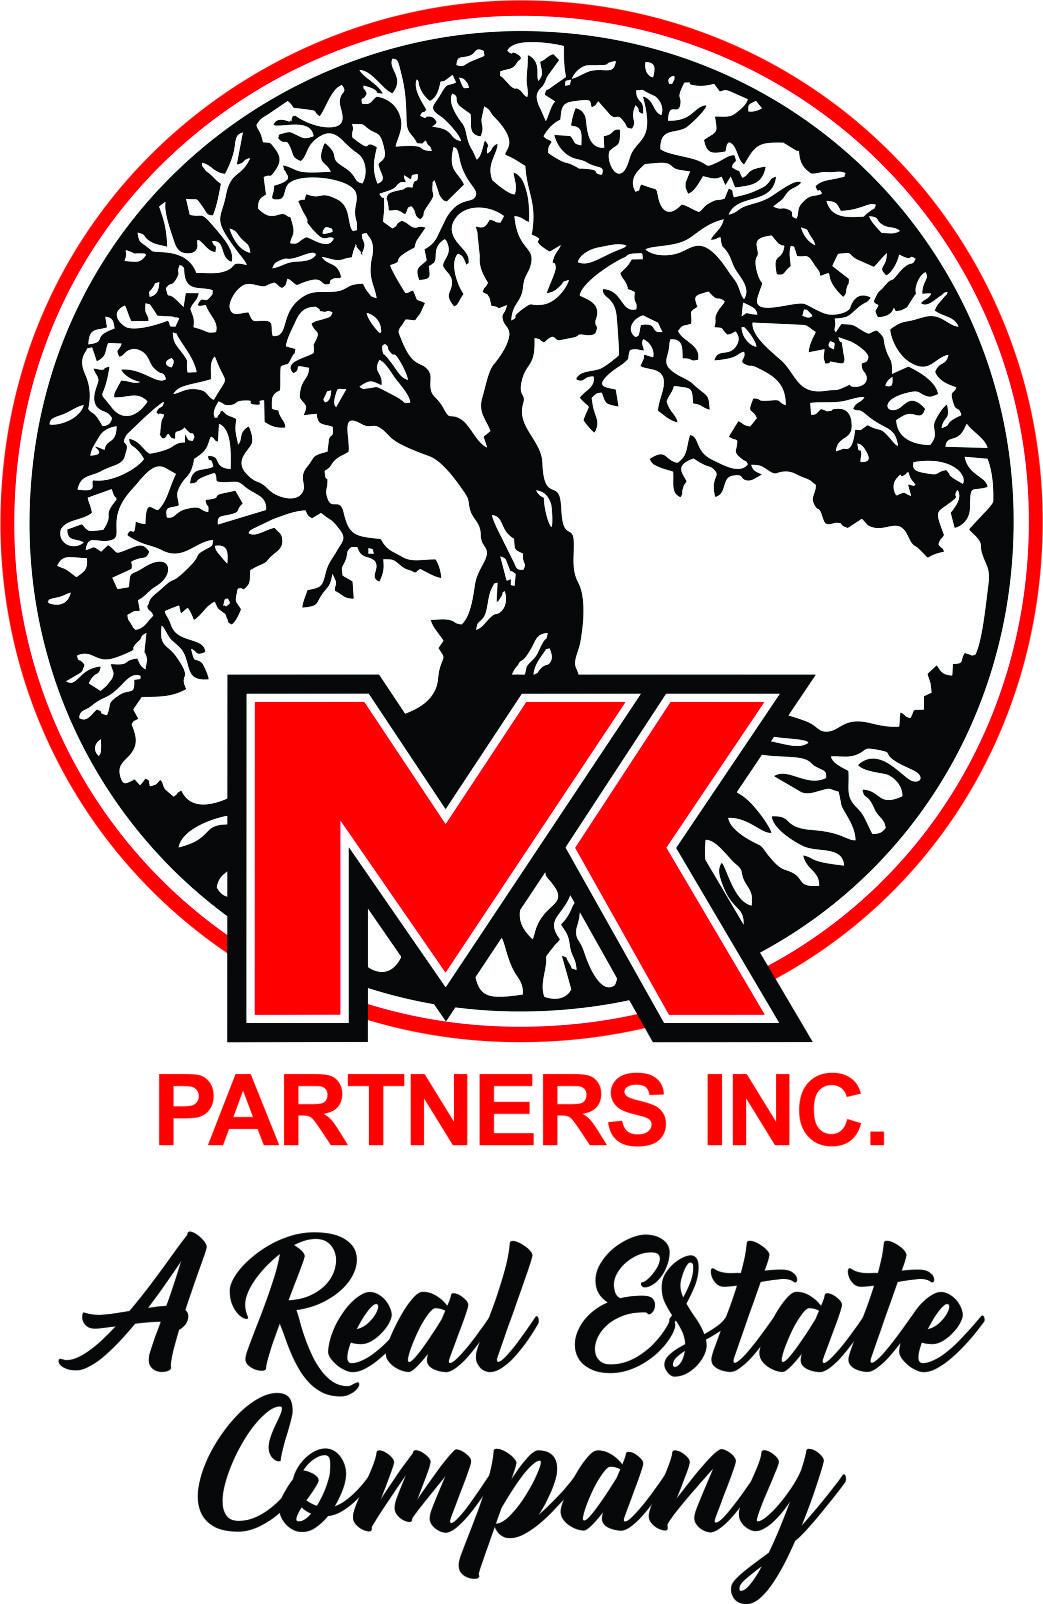 mk partners logo 02-19.jpg